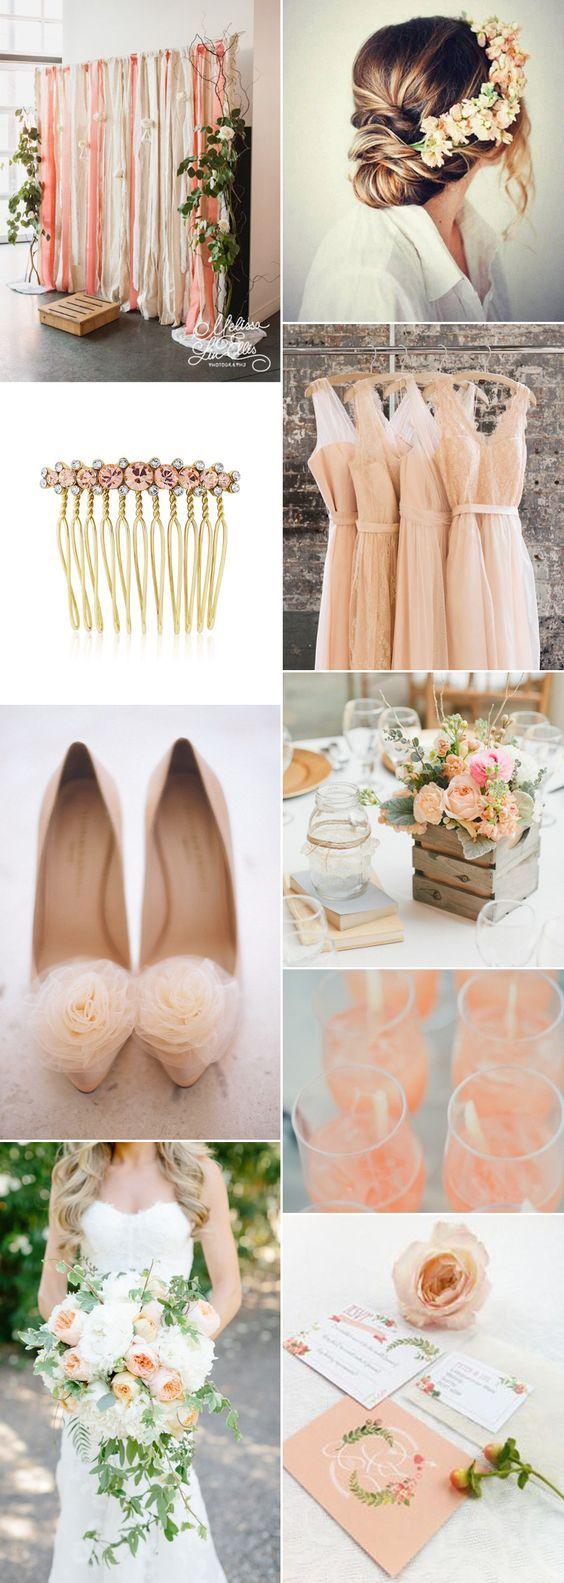 ideas for a peaches & cream wedding theme   wedding ideas